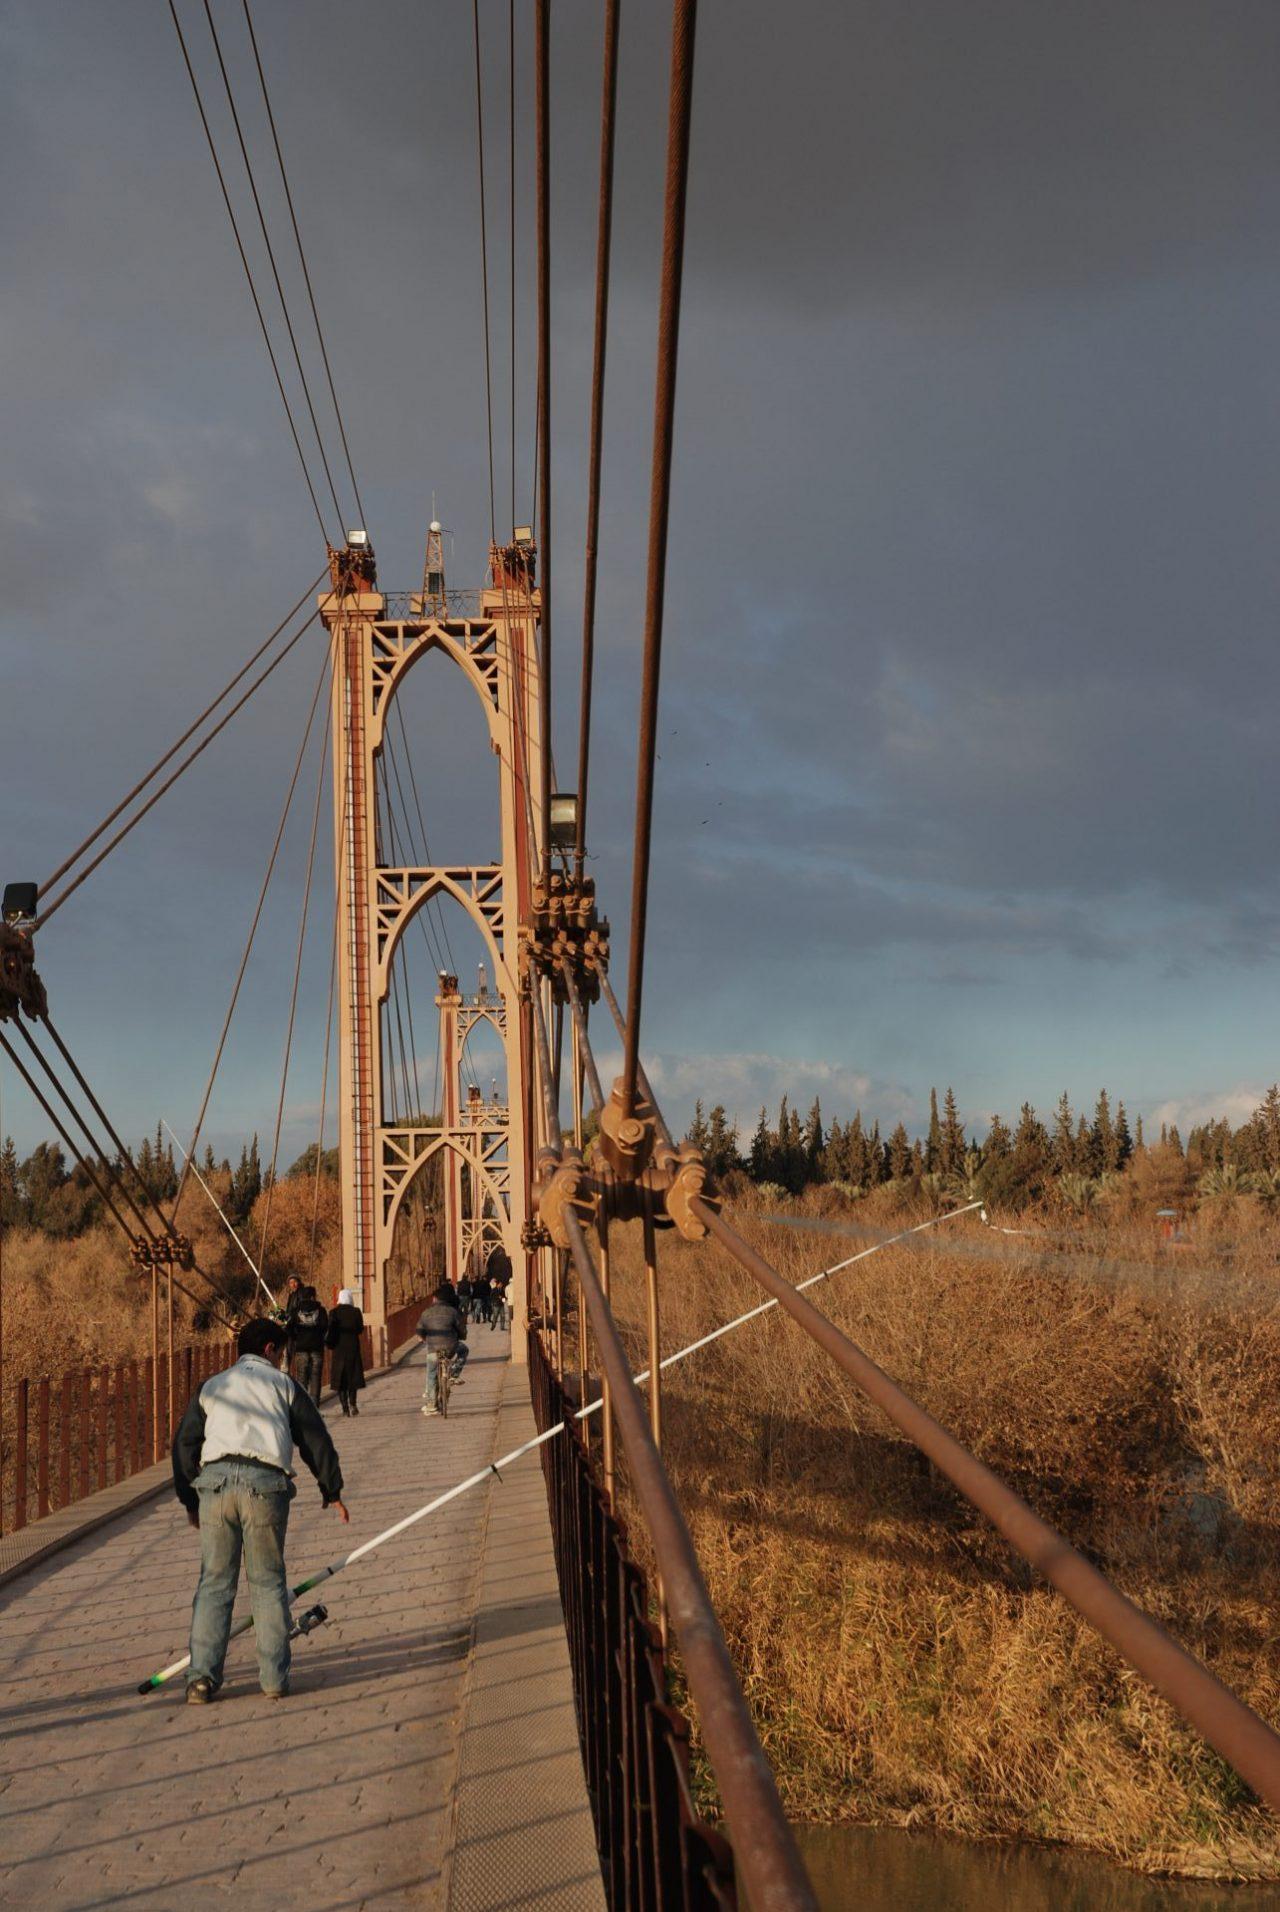 Syrie-Pont-des Français-Euphrate